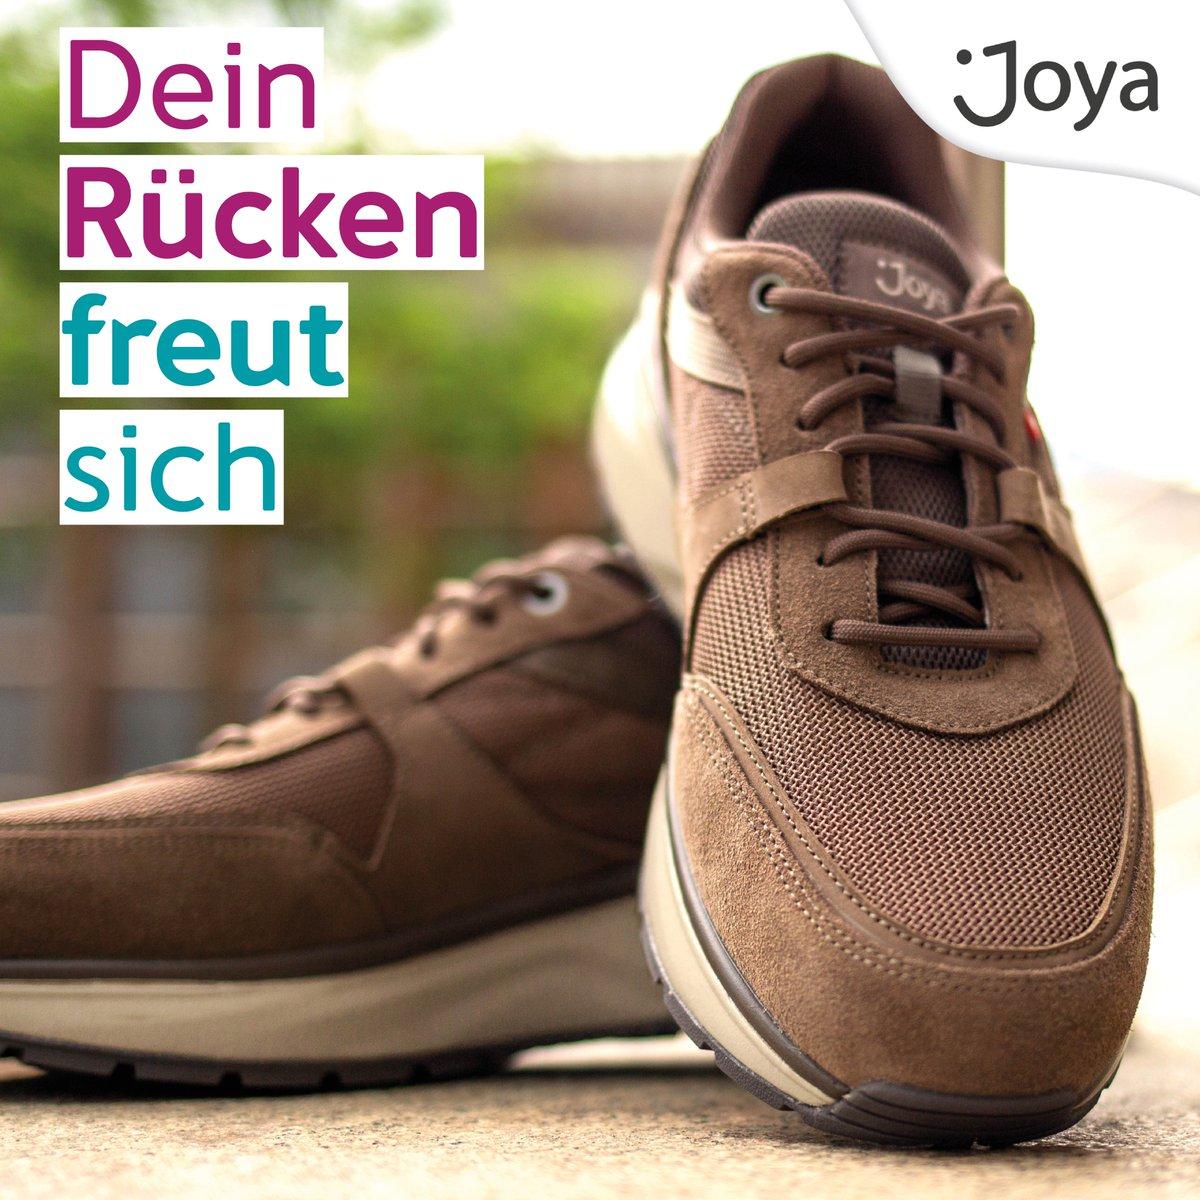 Joya Schuhe (@joyaschuhe) | Twitter